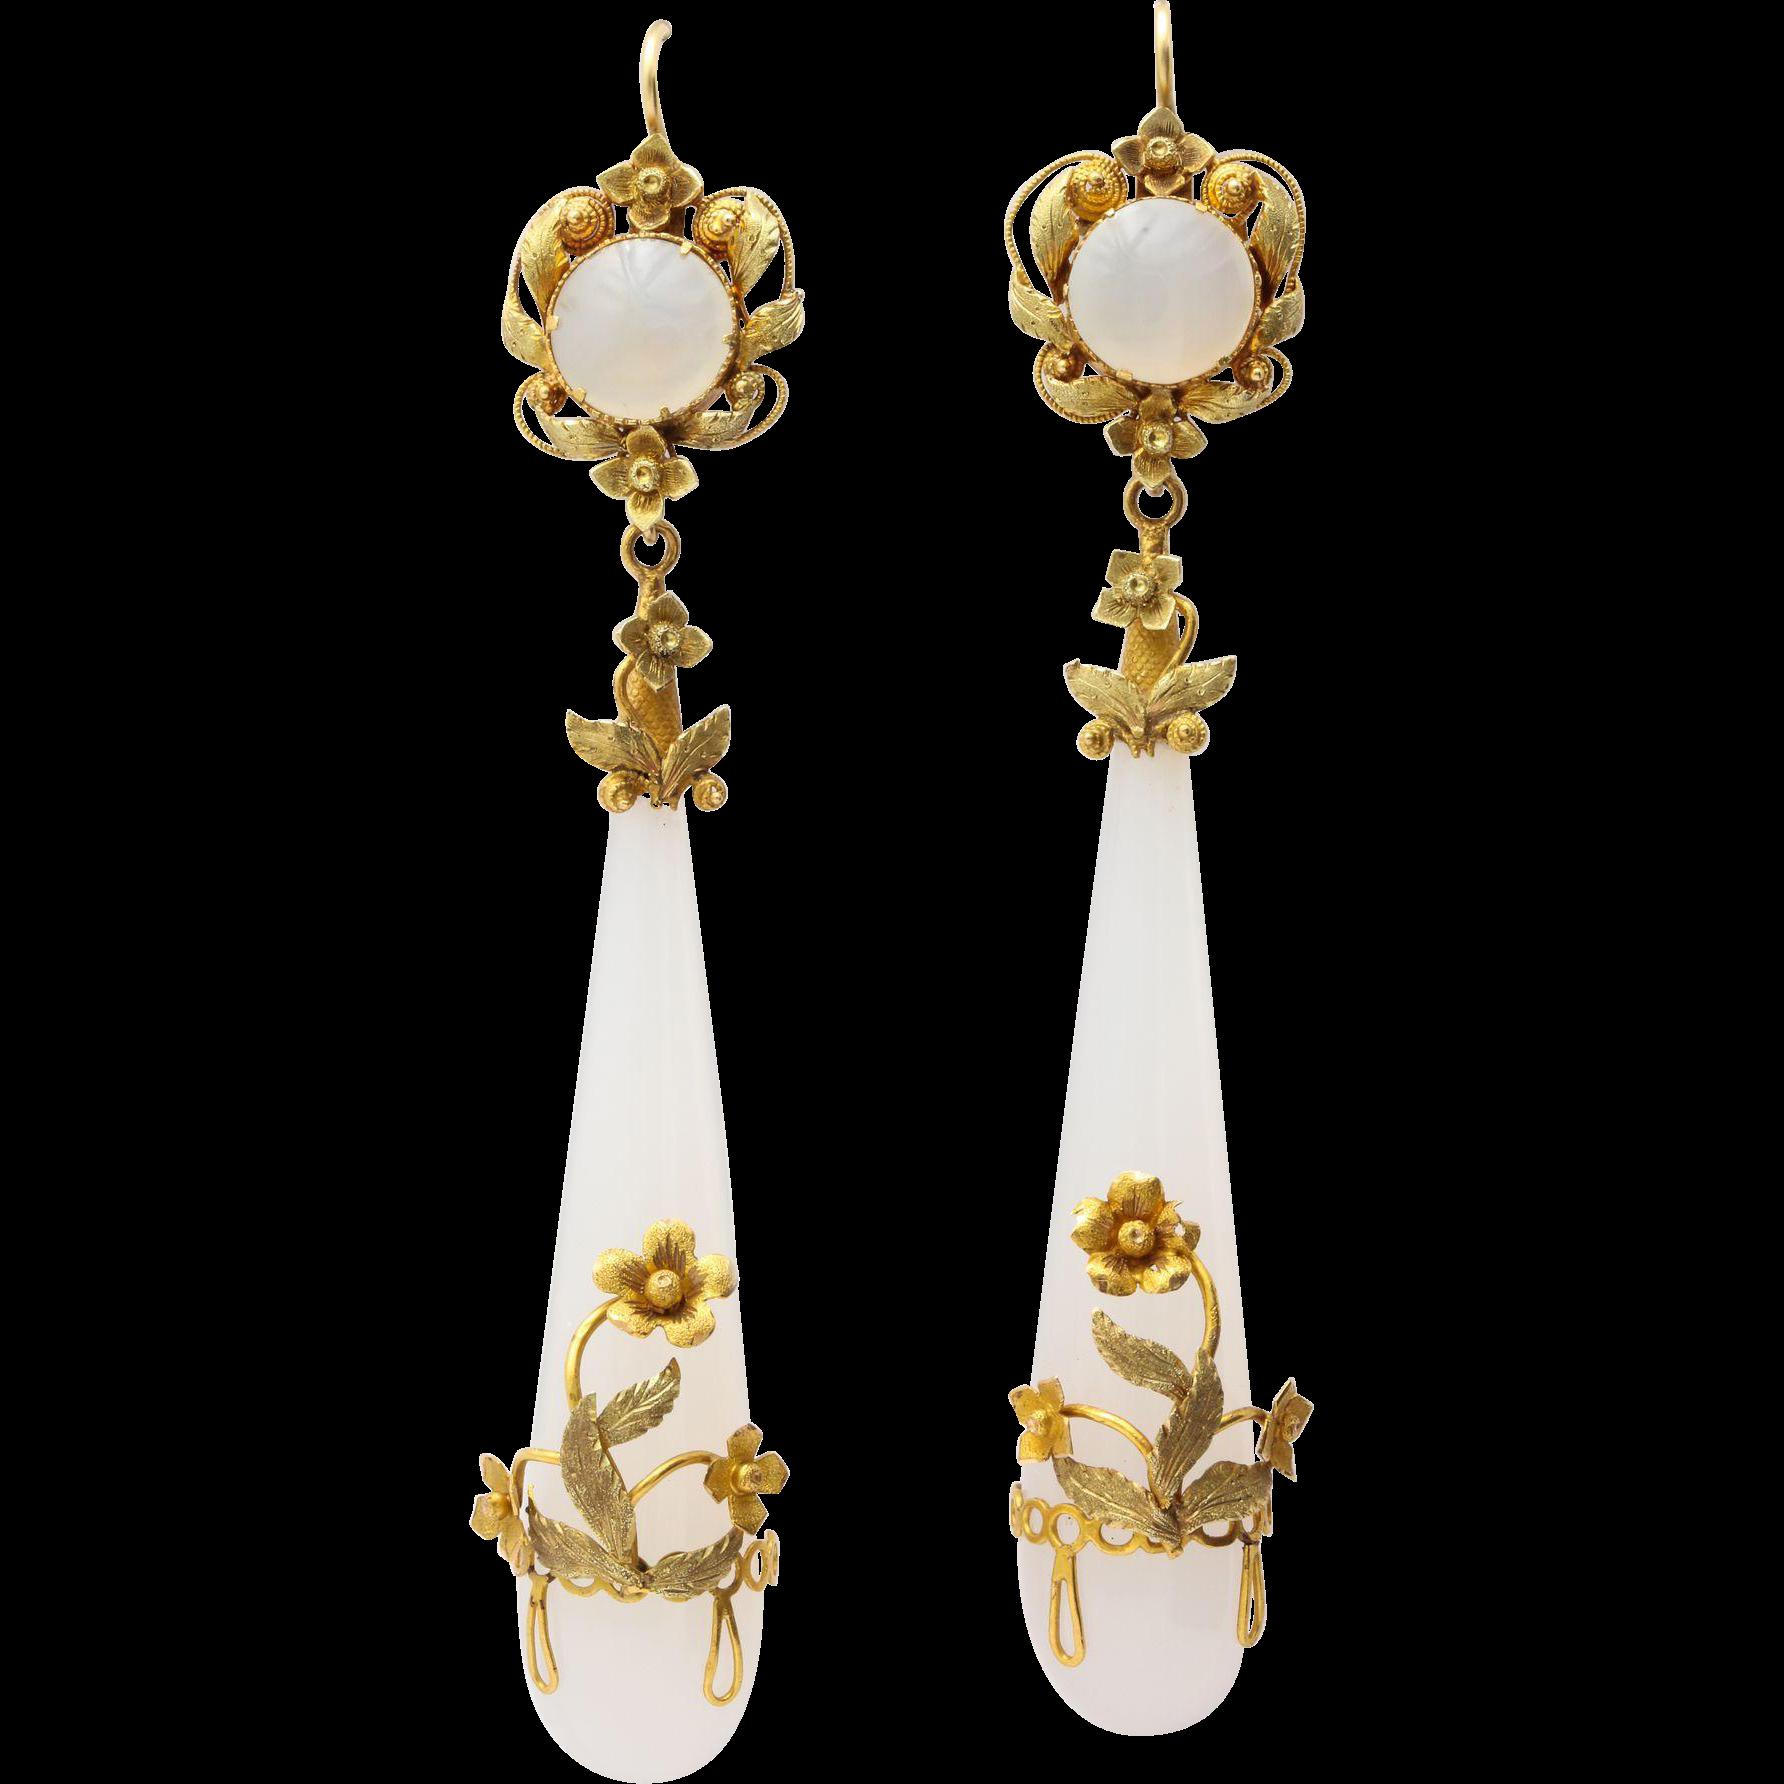 Georgian wrapped chalcedony chandelier earrings chandelier elegant georgian wrapped chalcedony chandelier earrings arubaitofo Images